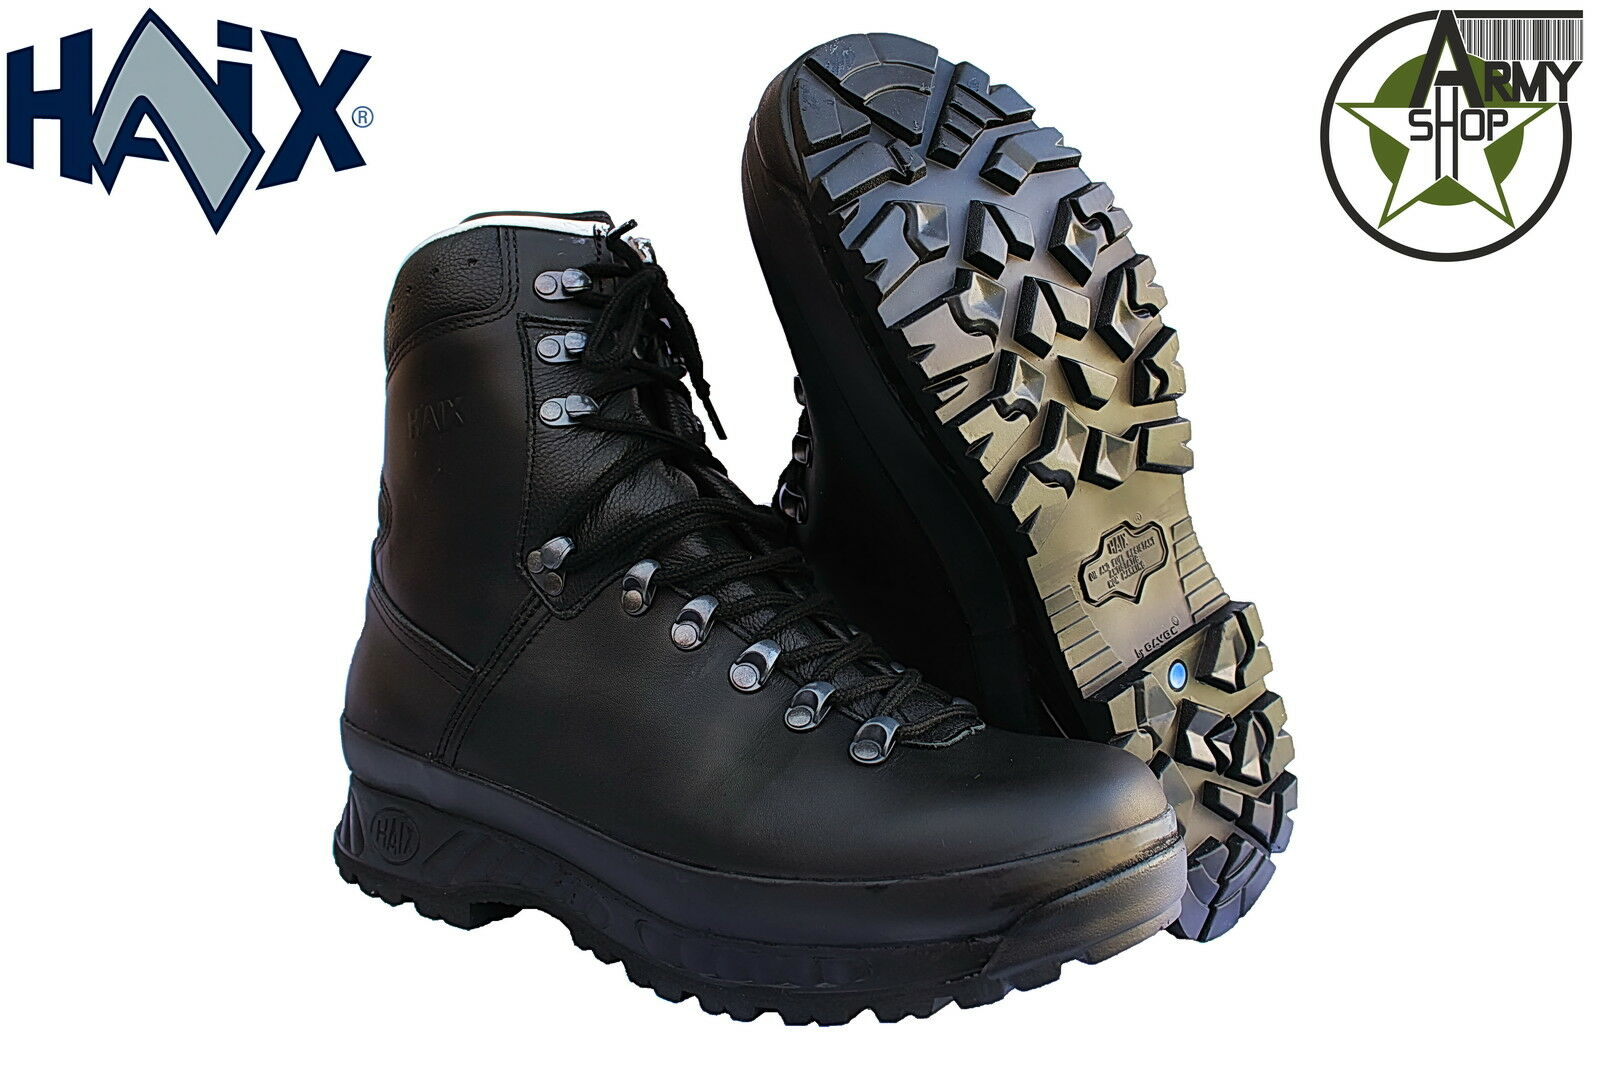 Haix Zapato de montaña botas combate BW ORIGINAL Negras Nueva